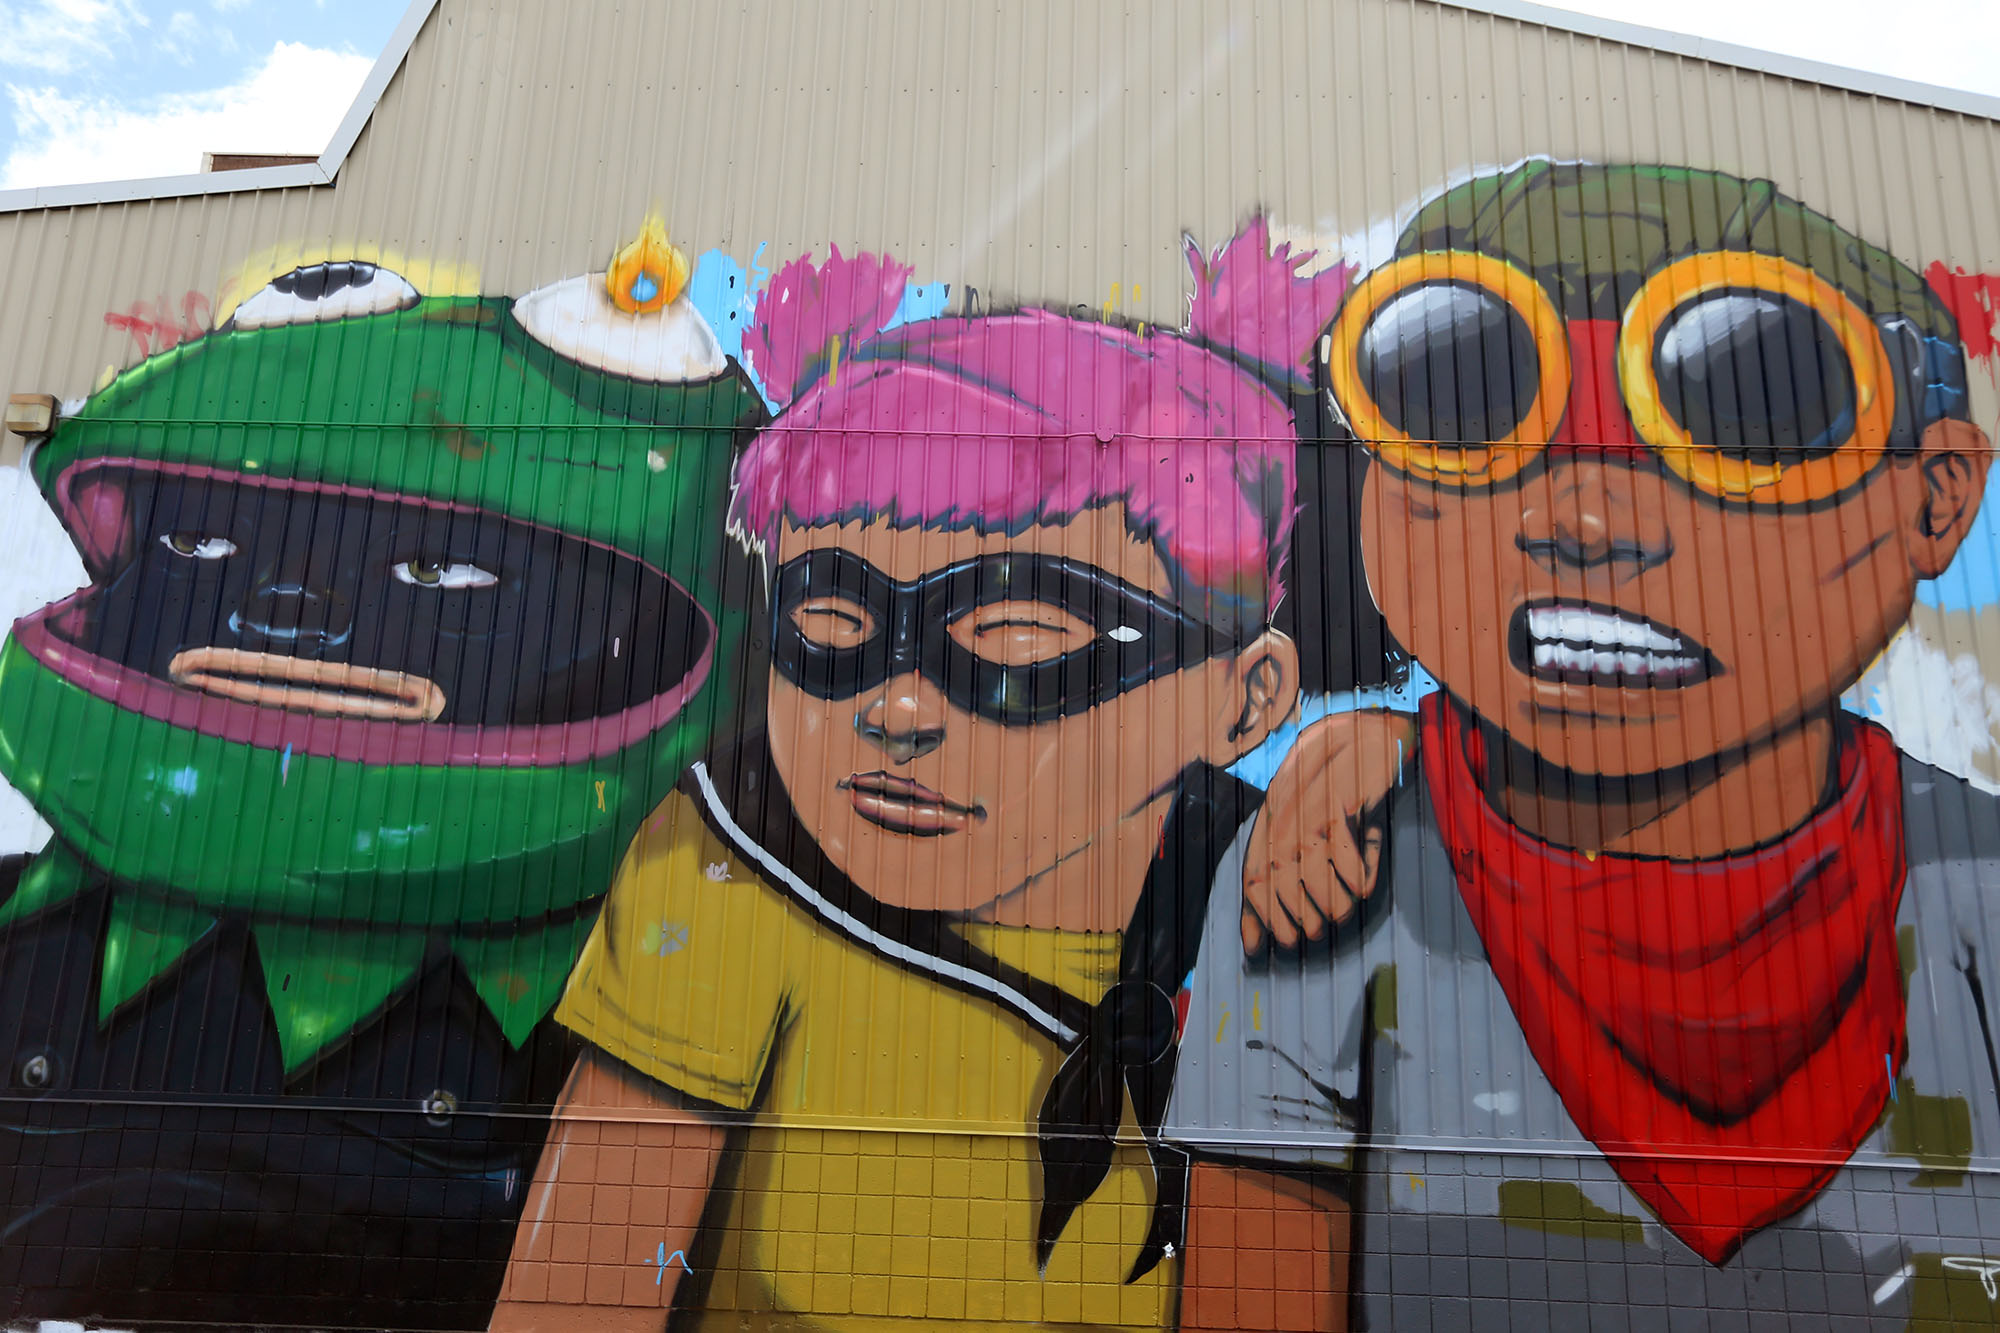 pow wow 2016 hawaii hebru brantley grafite mural dionisio arte (4)